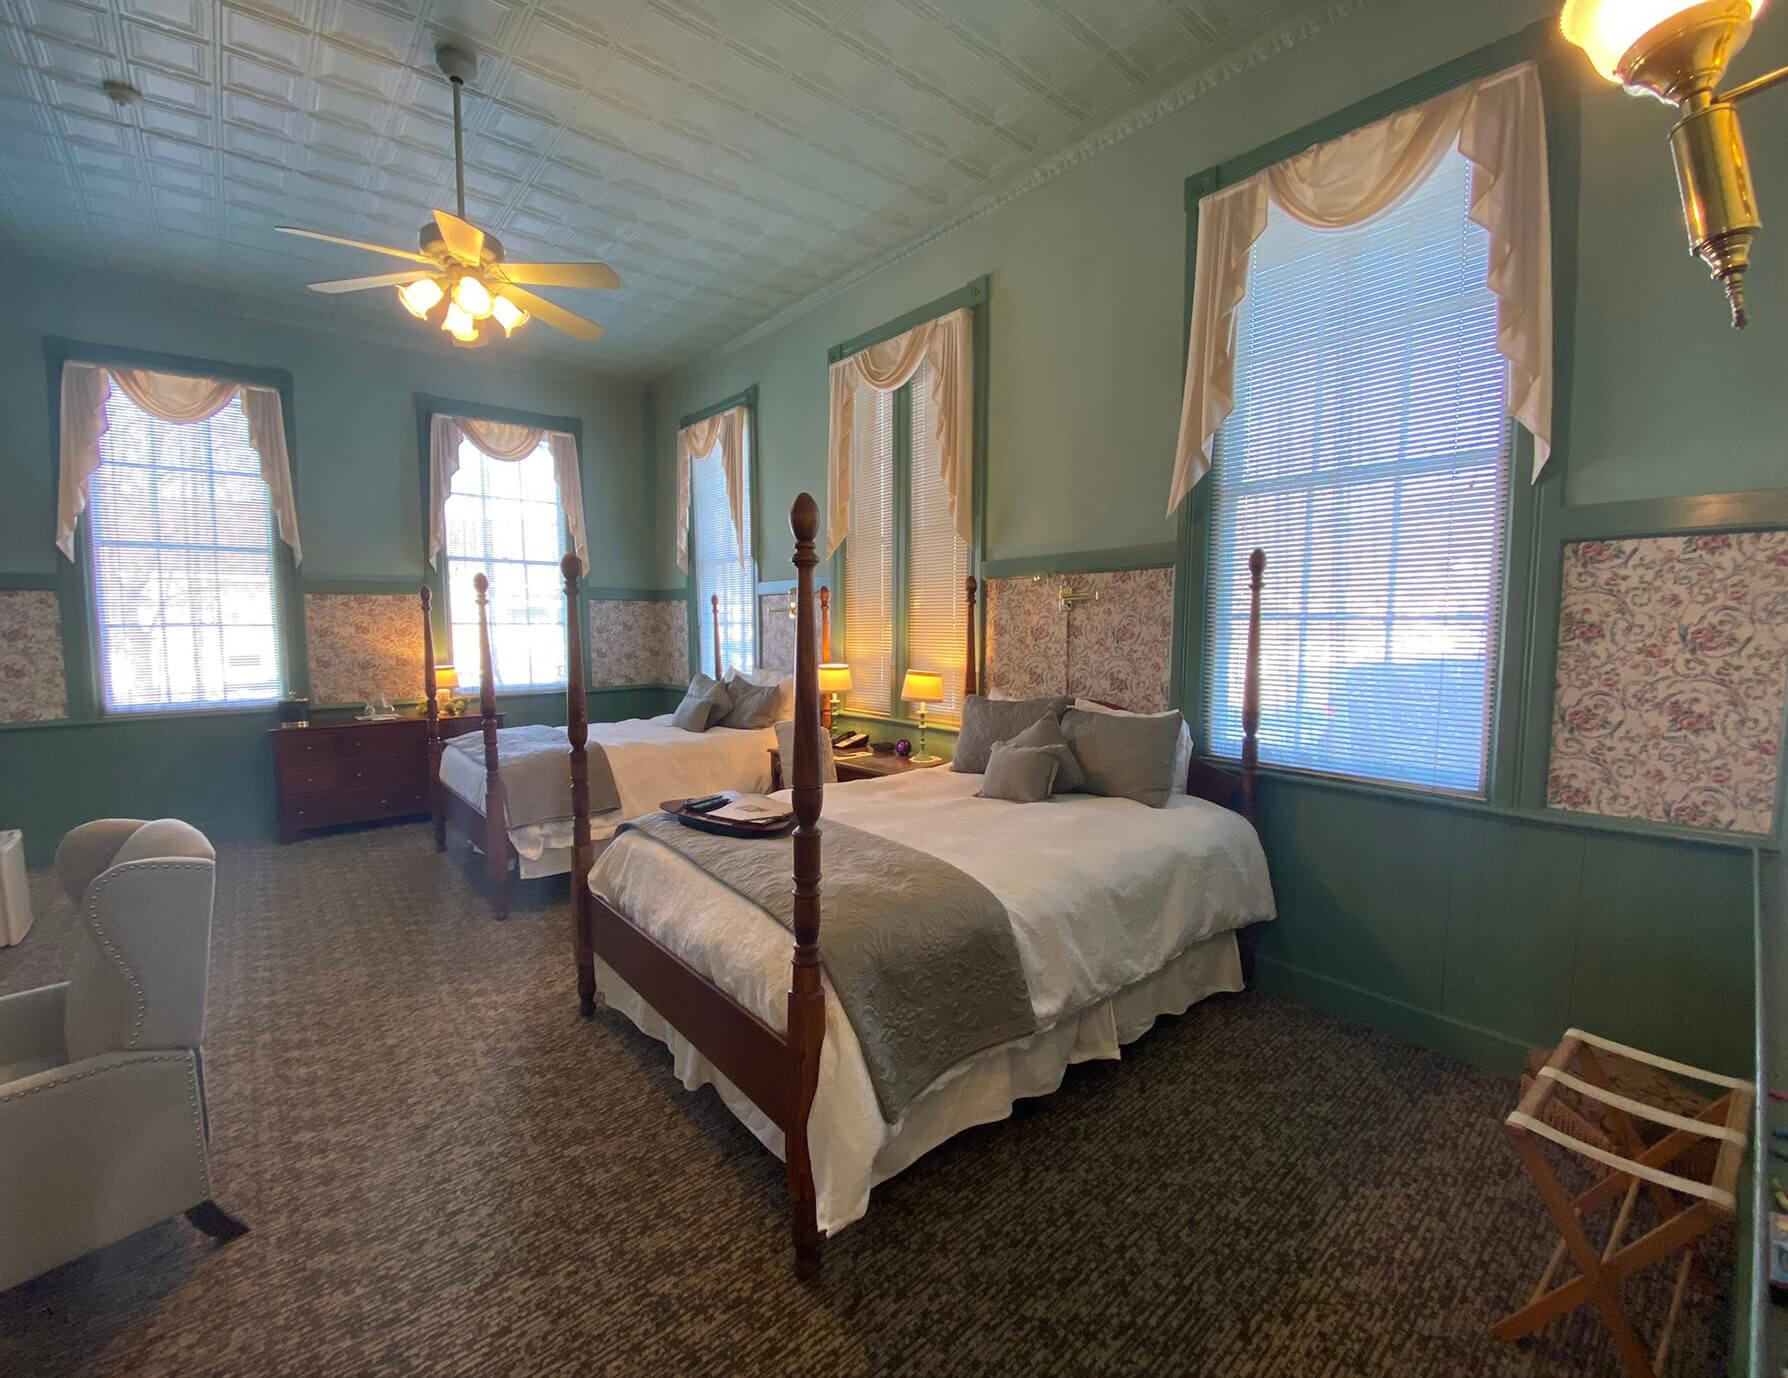 La Sedgwick room beds at a Hotel in Lenox, MA